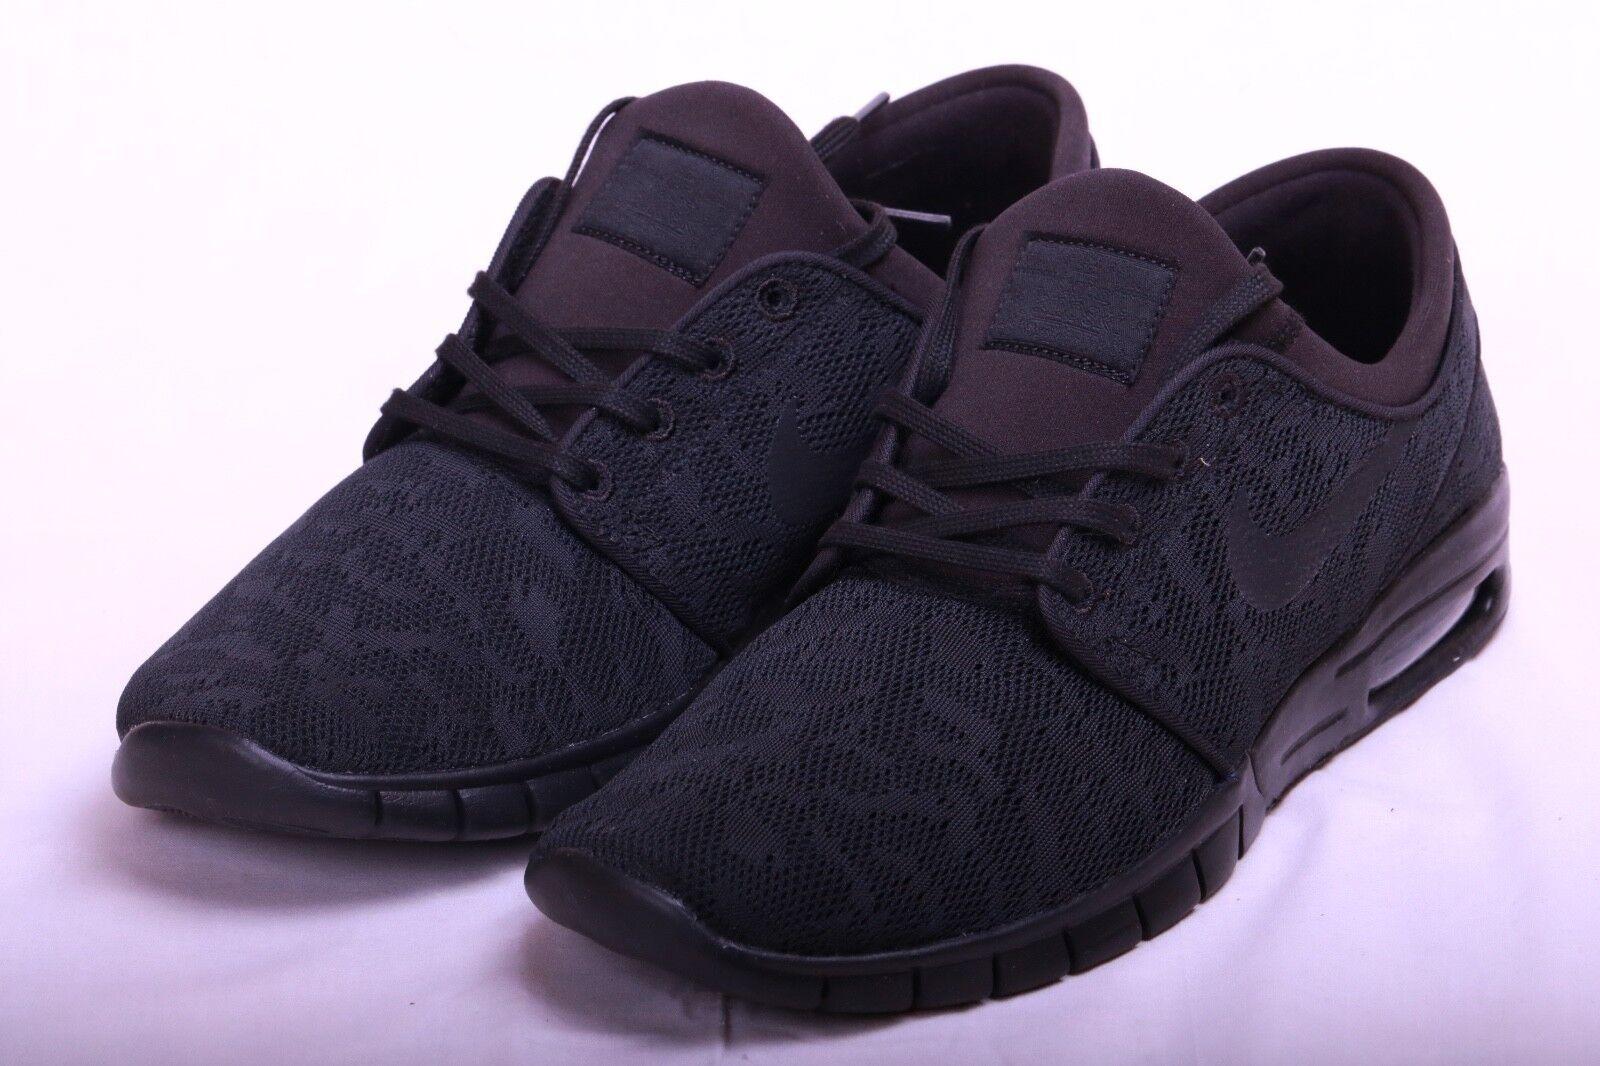 Nike SB Stefan Janoski Max Triple Nero Neroout 631303 099 Size 11